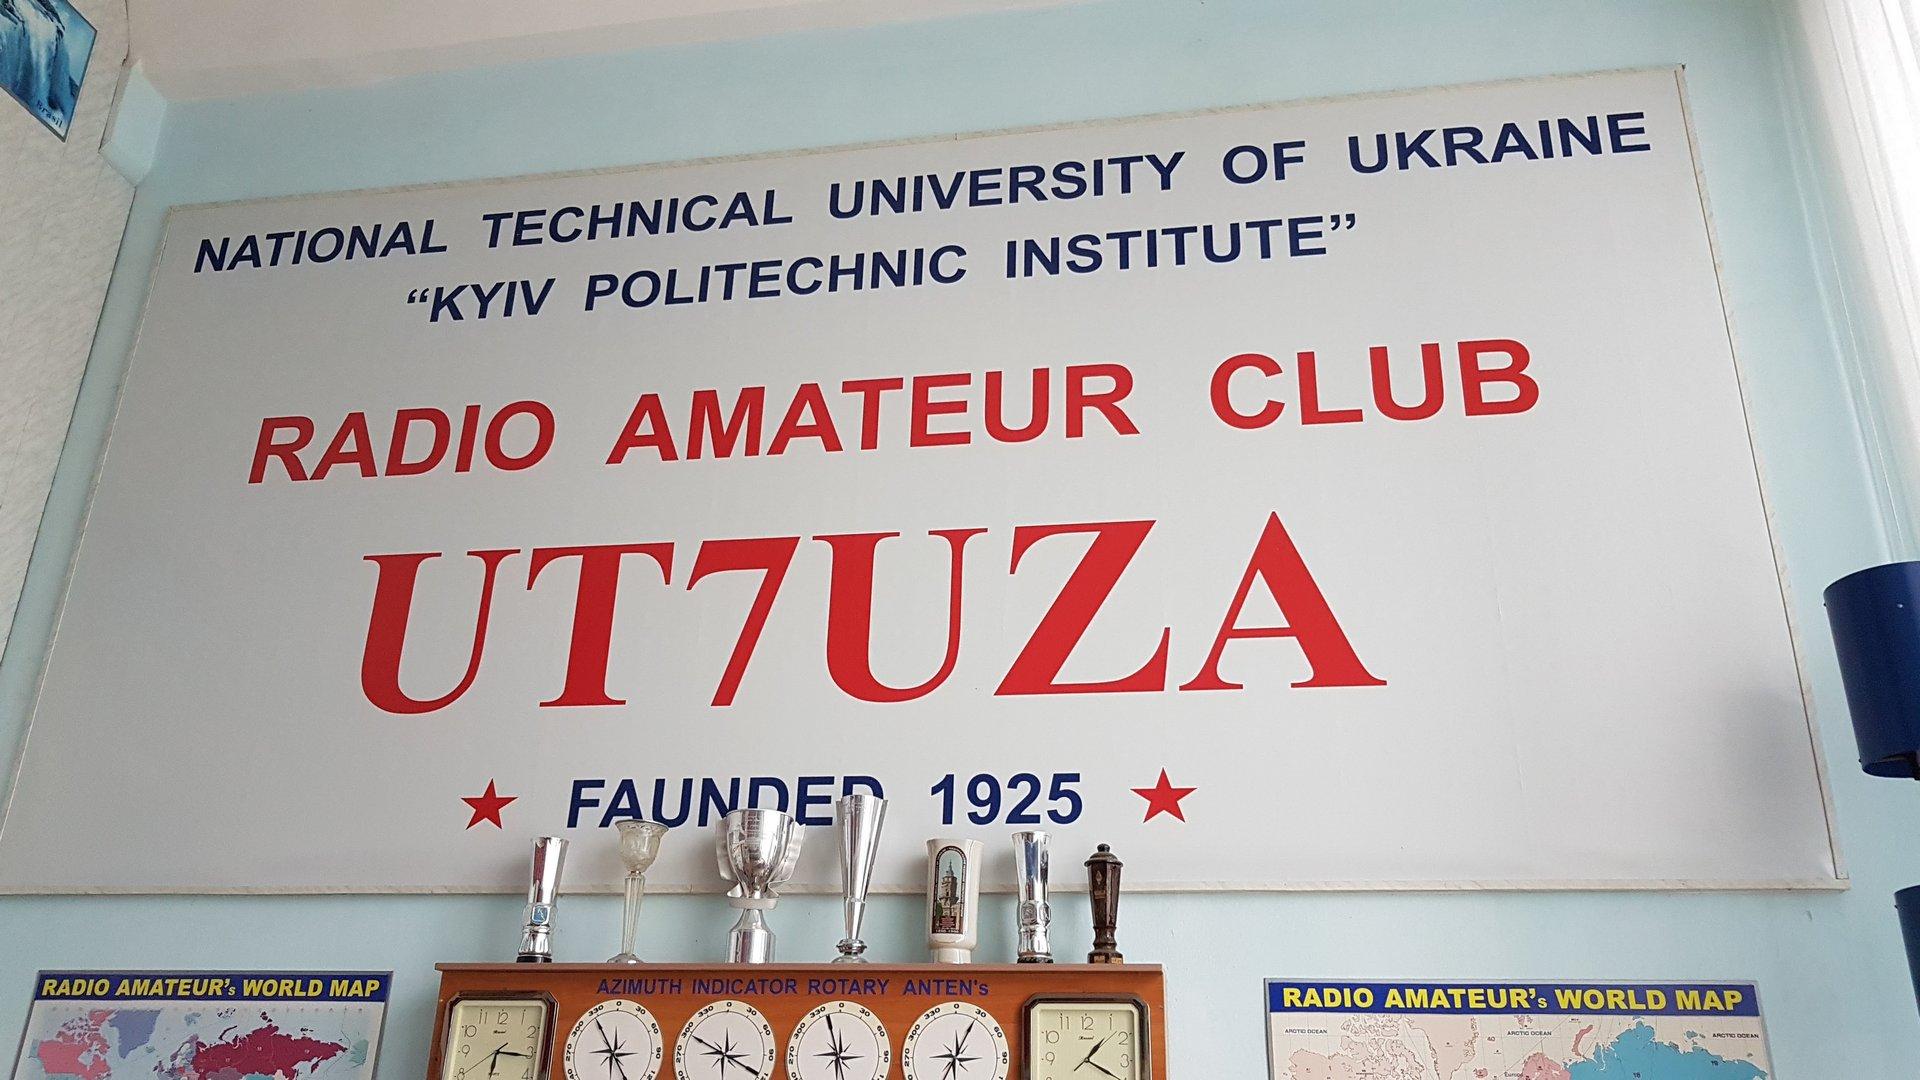 Нажмите на изображение для увеличения.  Название:Панно Club KPI UT7UZA.jpg Просмотров:2 Размер:274.3 Кб ID:194806